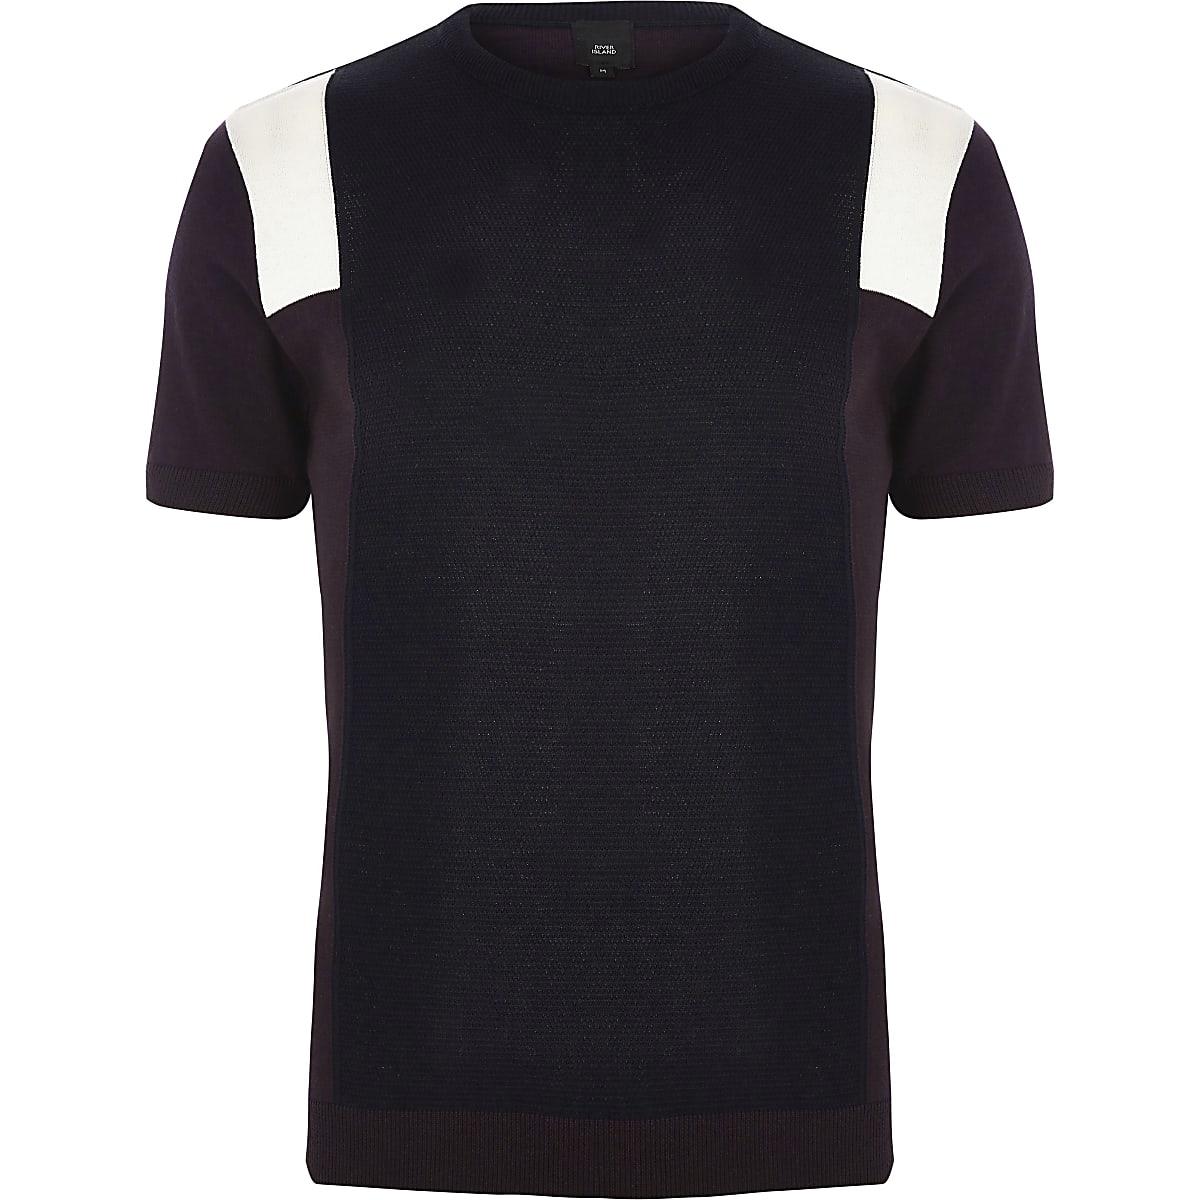 Vlakken Gebreid Donkerrood T Shirts Met Shirt Slim Fit wO80mNnv